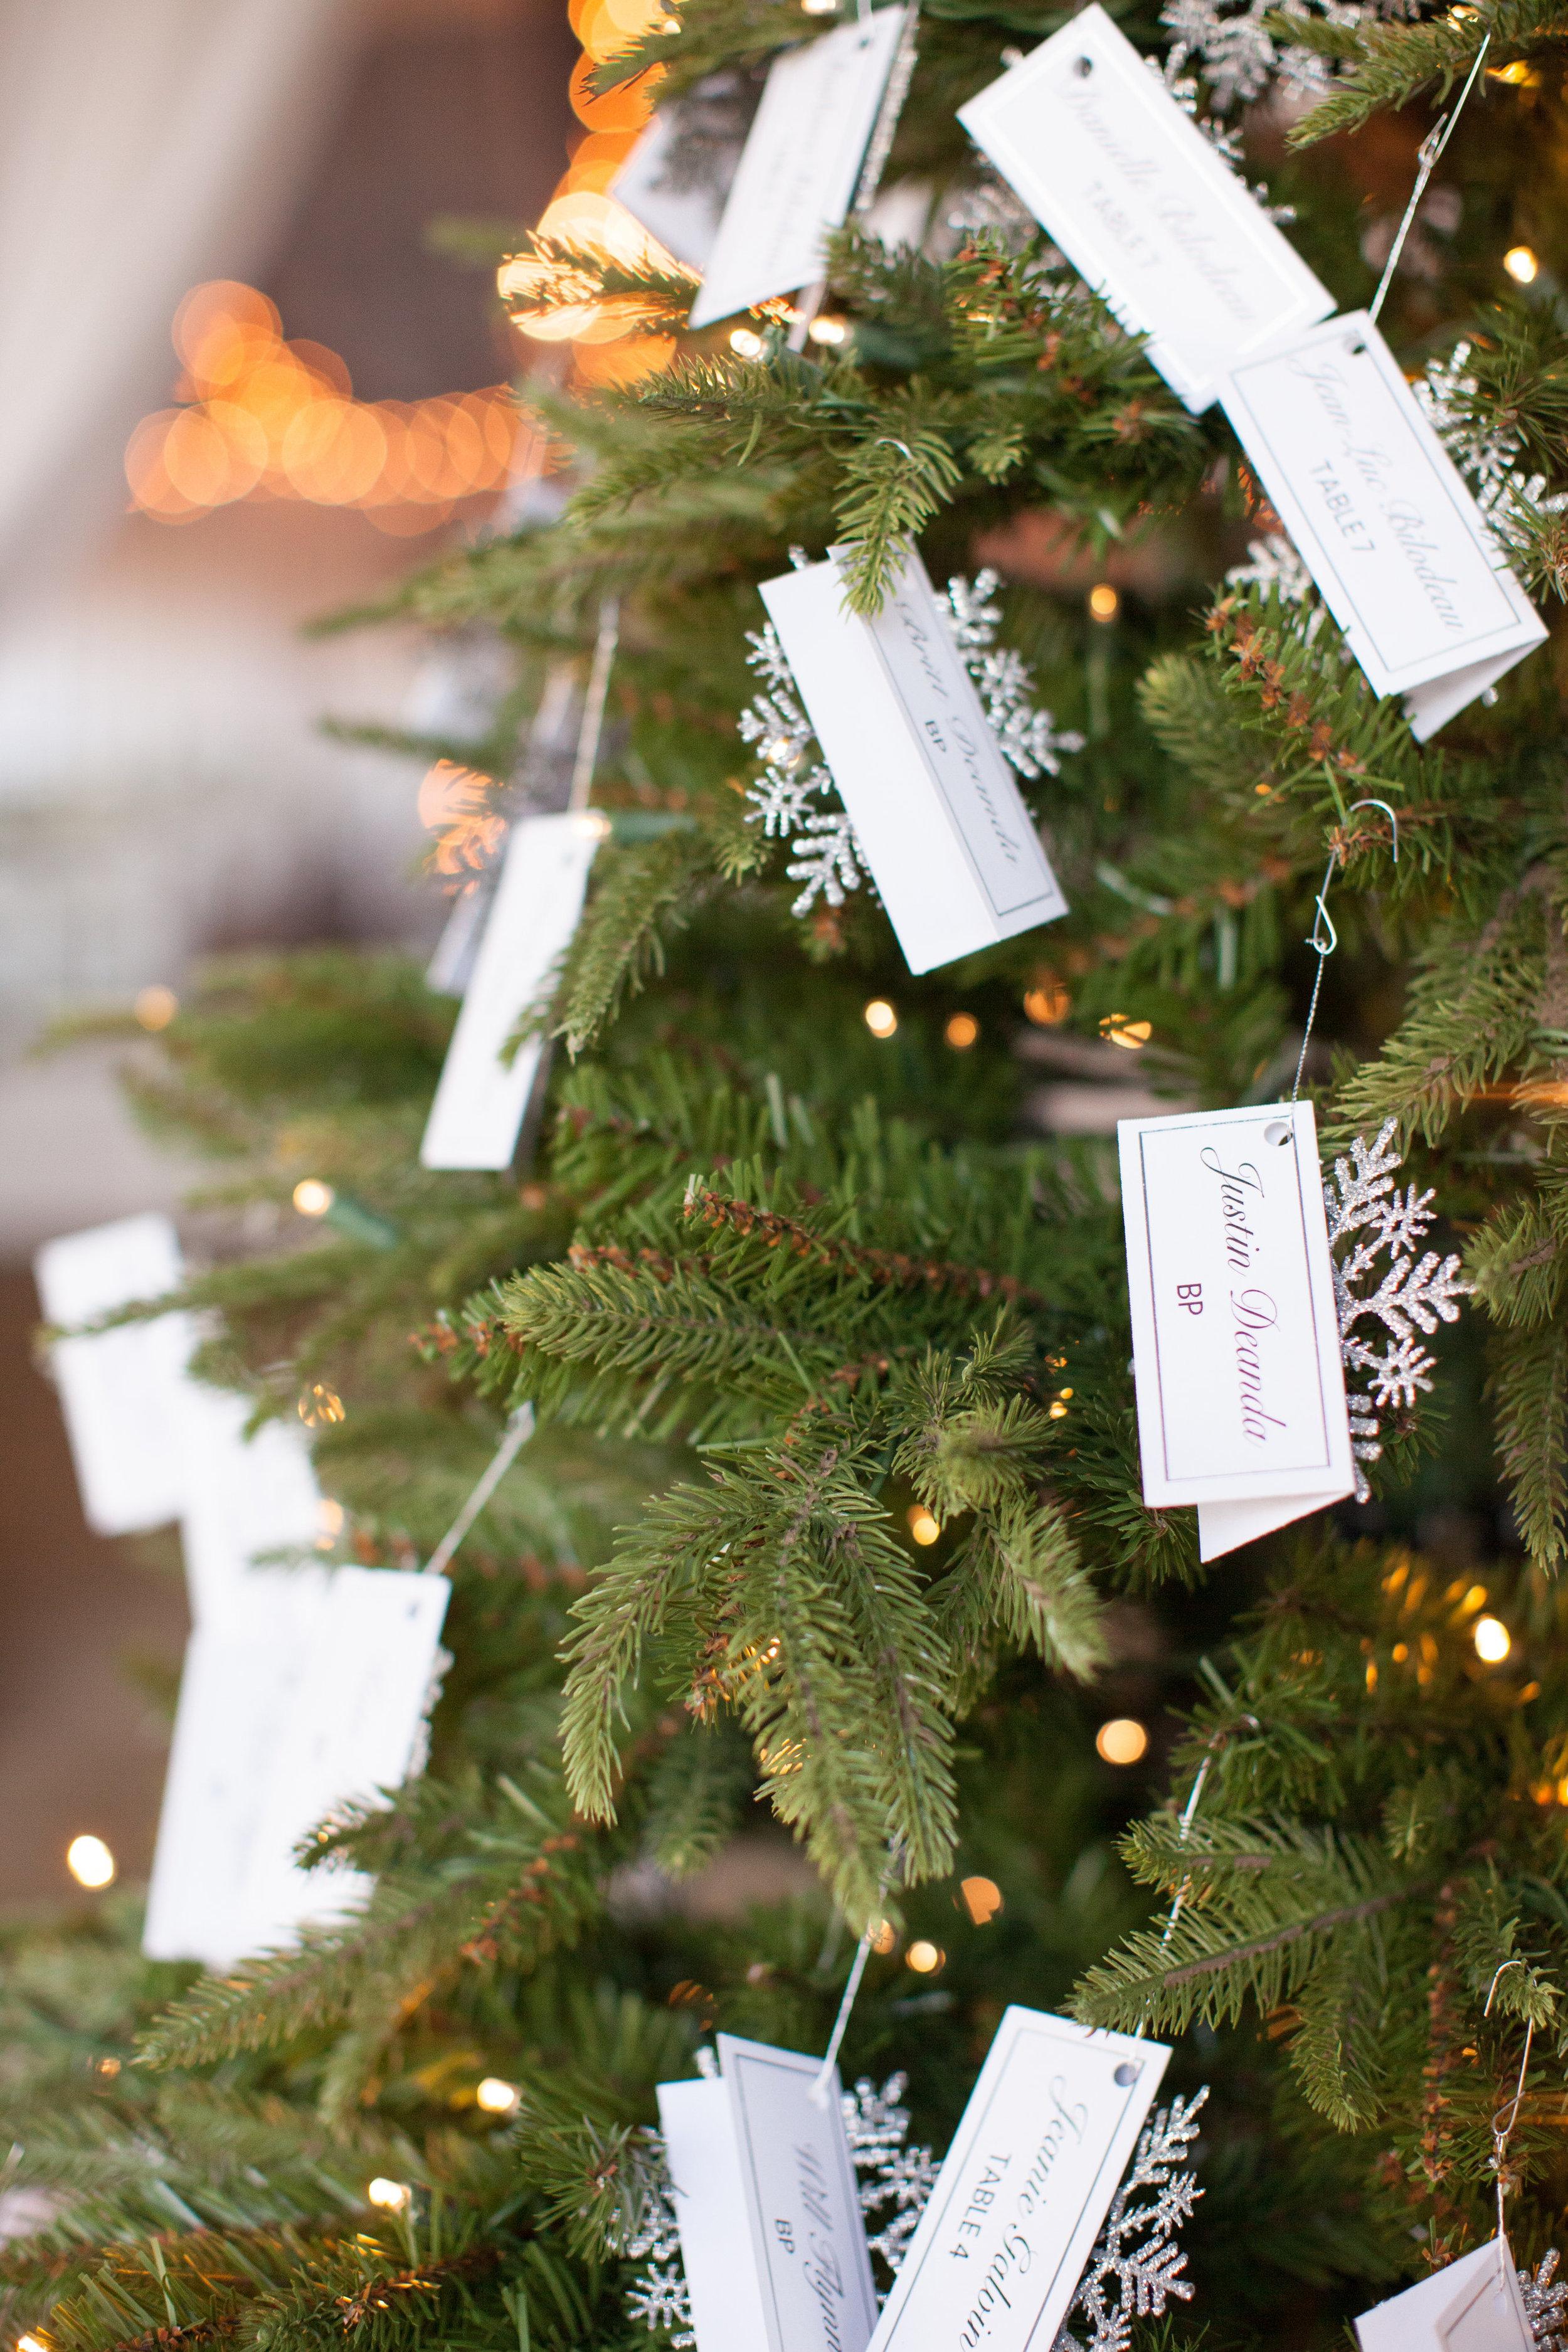 www.santabarbarawedding.com   Whispering Rose Ranch   Ann Johnson Events   Anna J Photo   Christmas Tree   Escort Cards